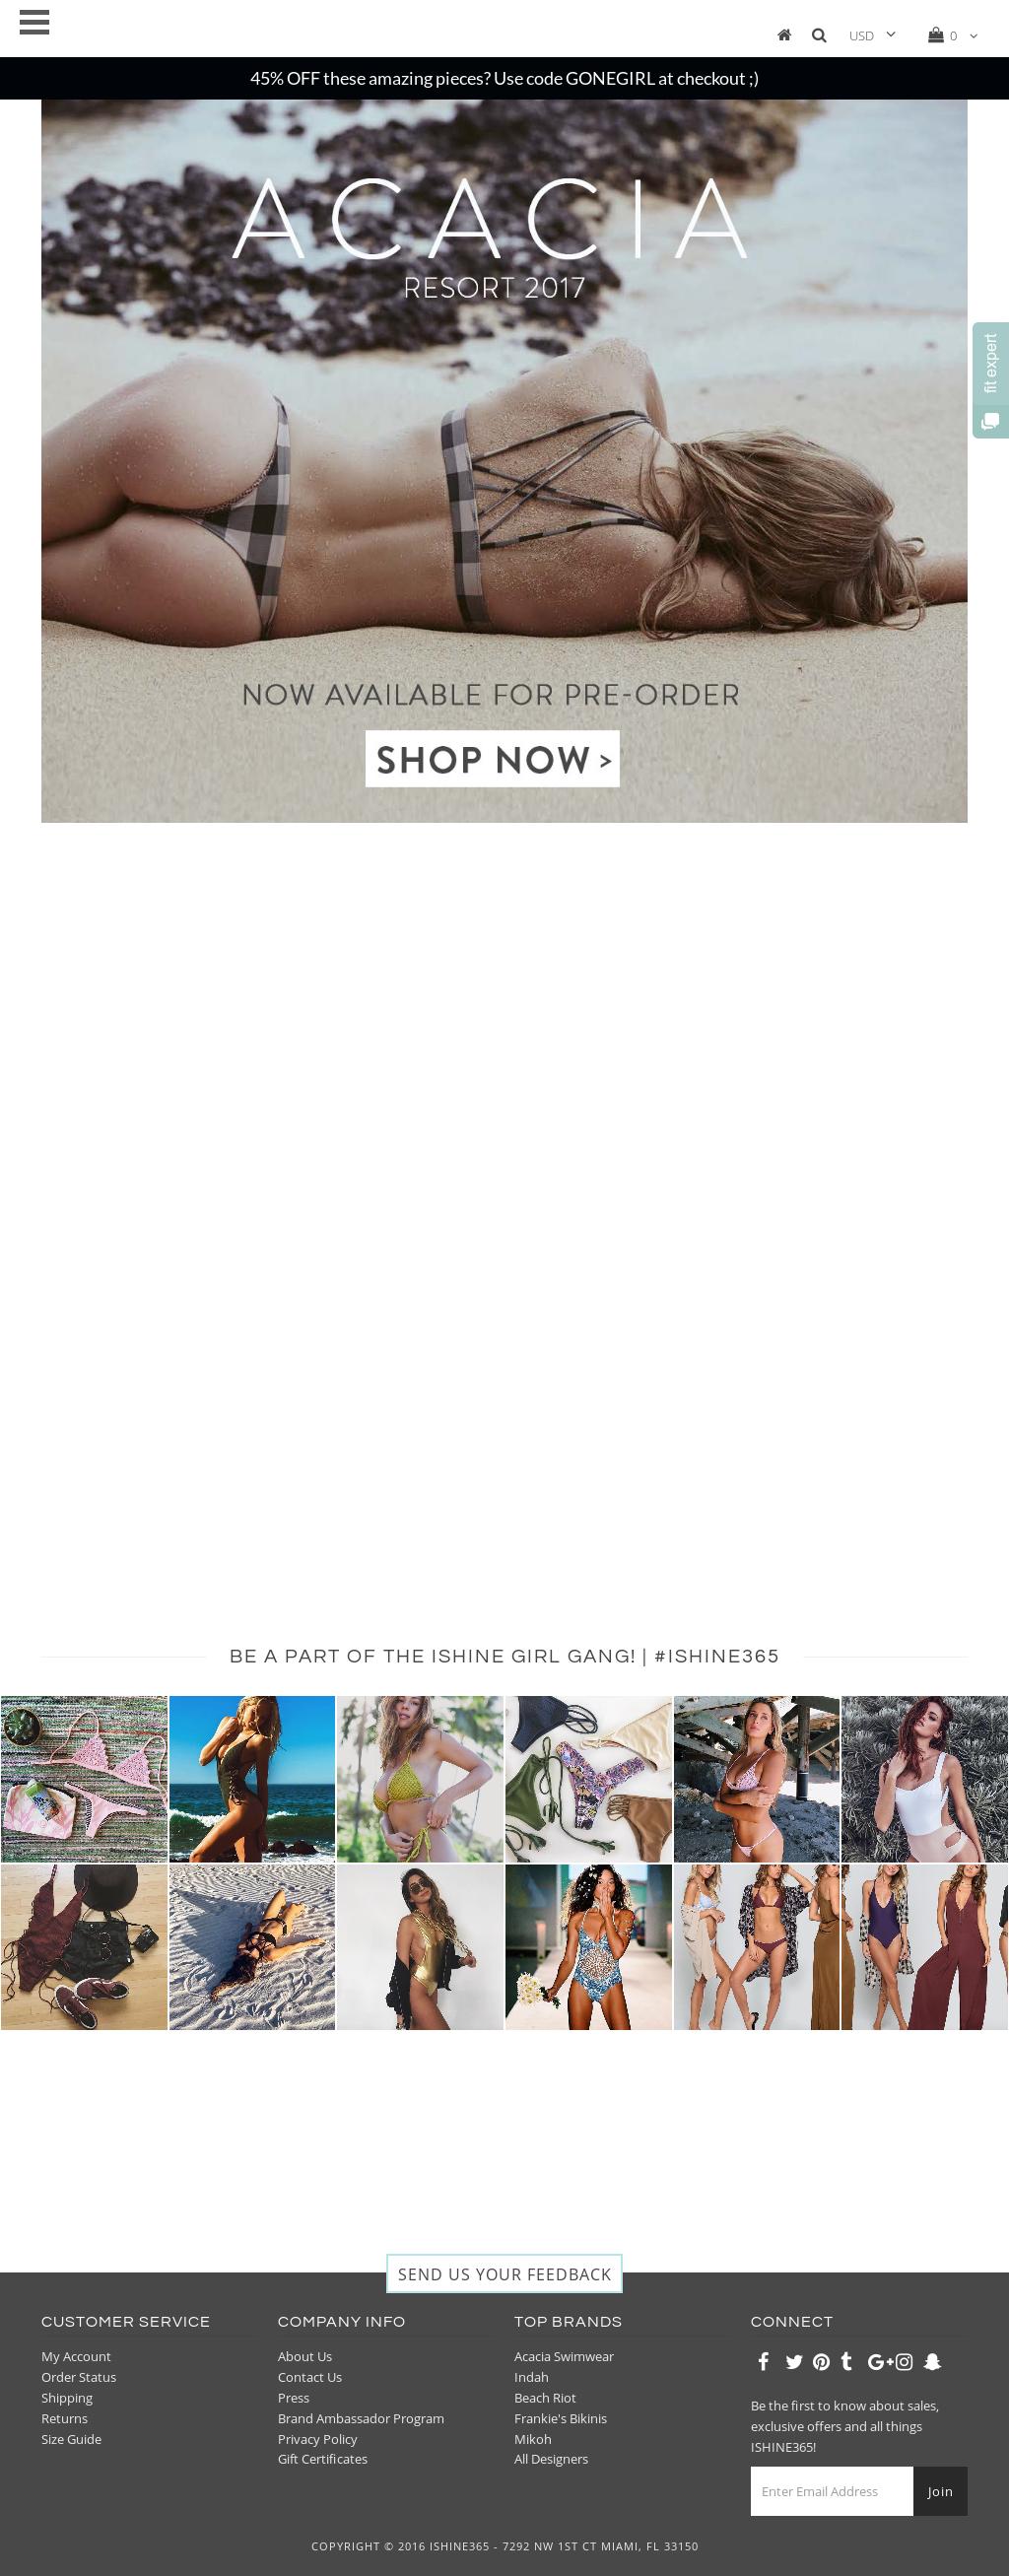 I Shine 365 Competitors, Revenue and Employees - Owler Company Profile